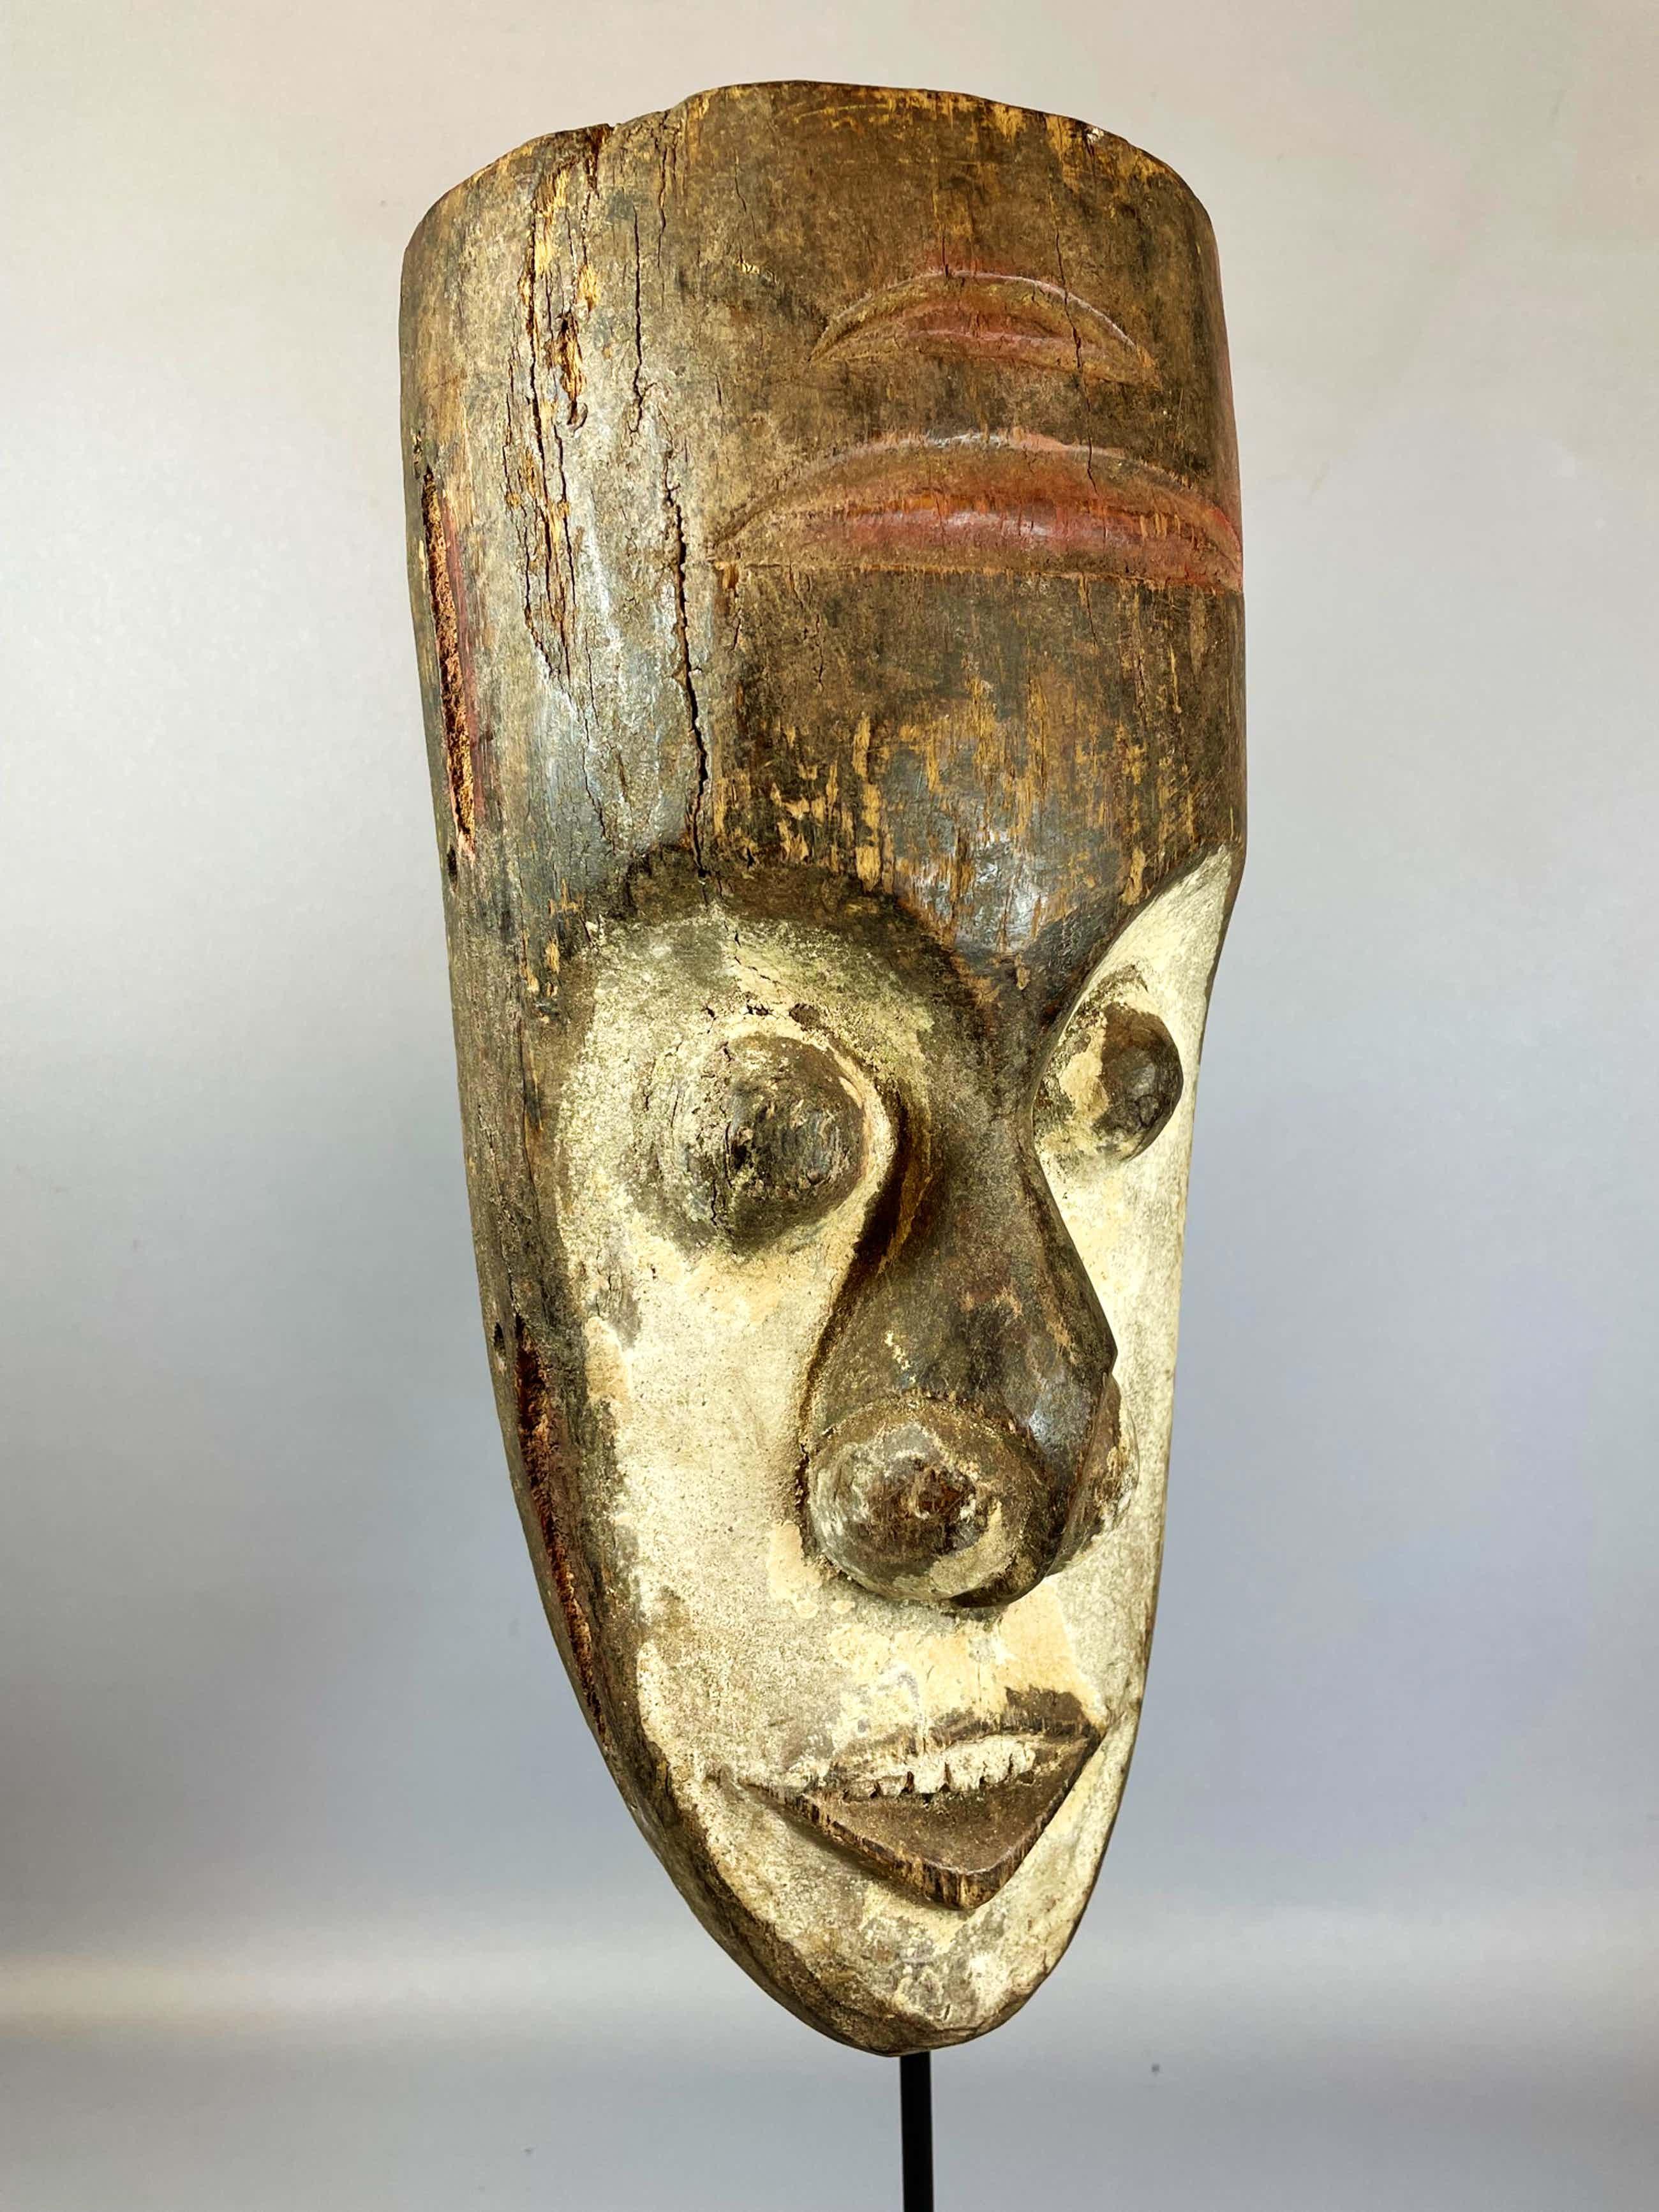 Igbo - Old African Igbo mask - Nigeria kopen? Bied vanaf 45!